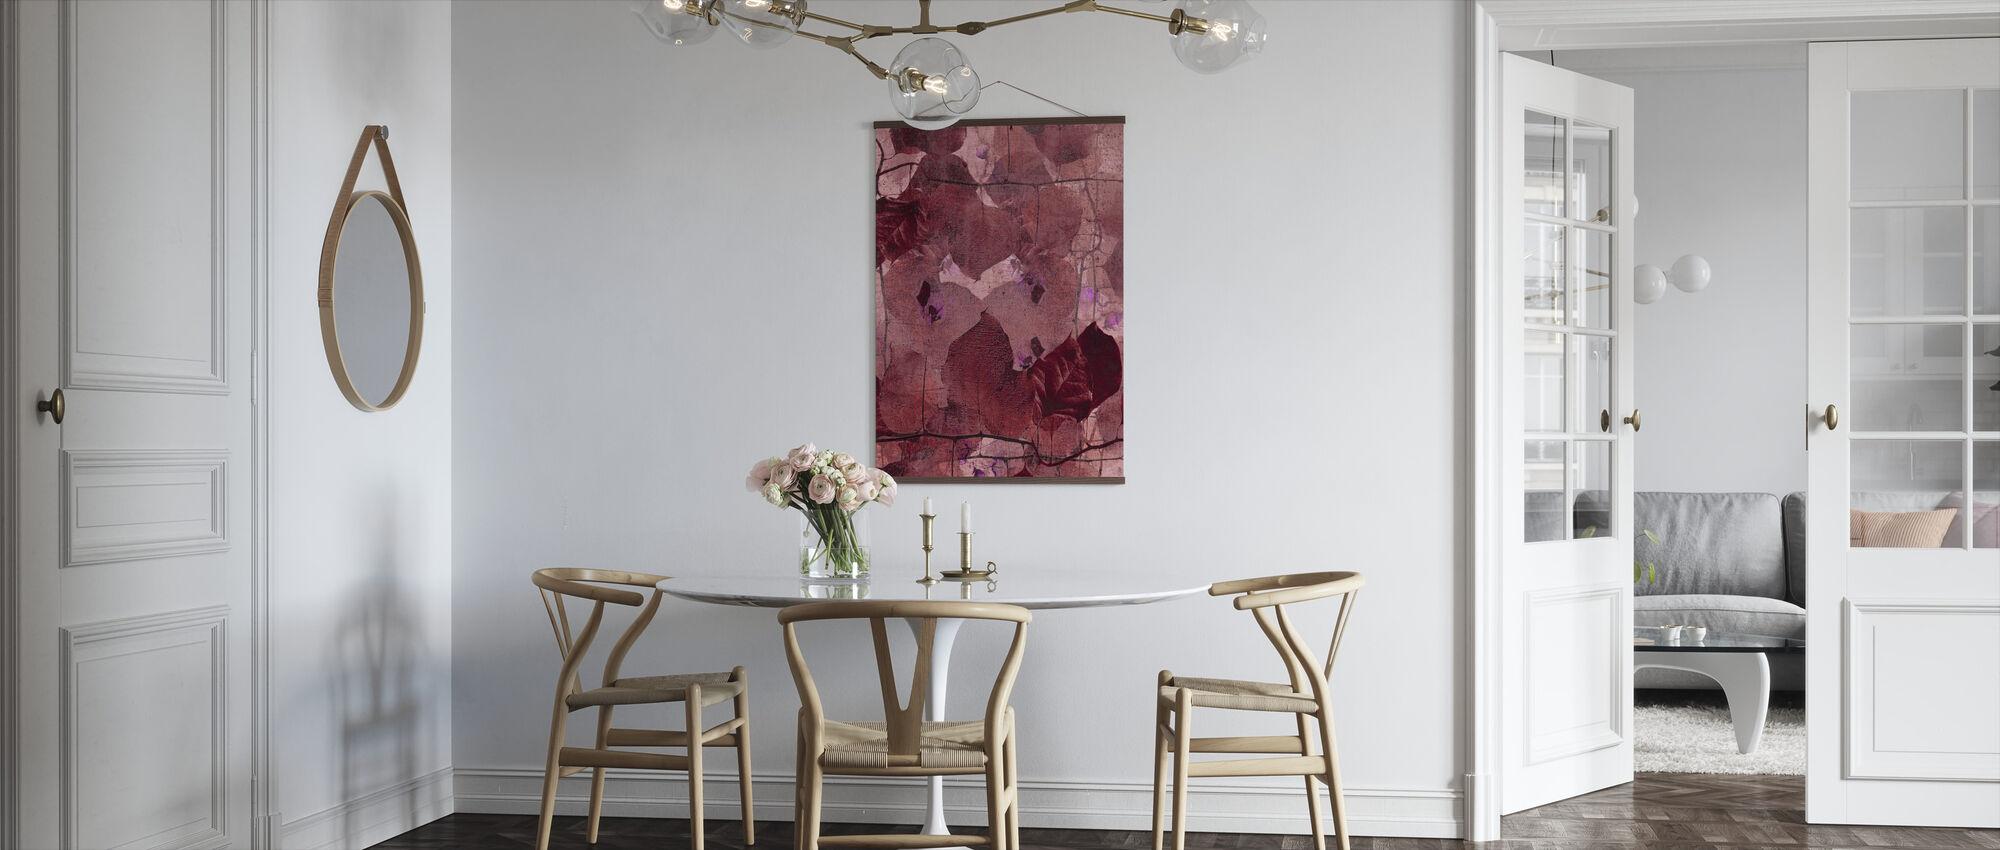 Bordeaux Grapevine - Plakat - Køkken